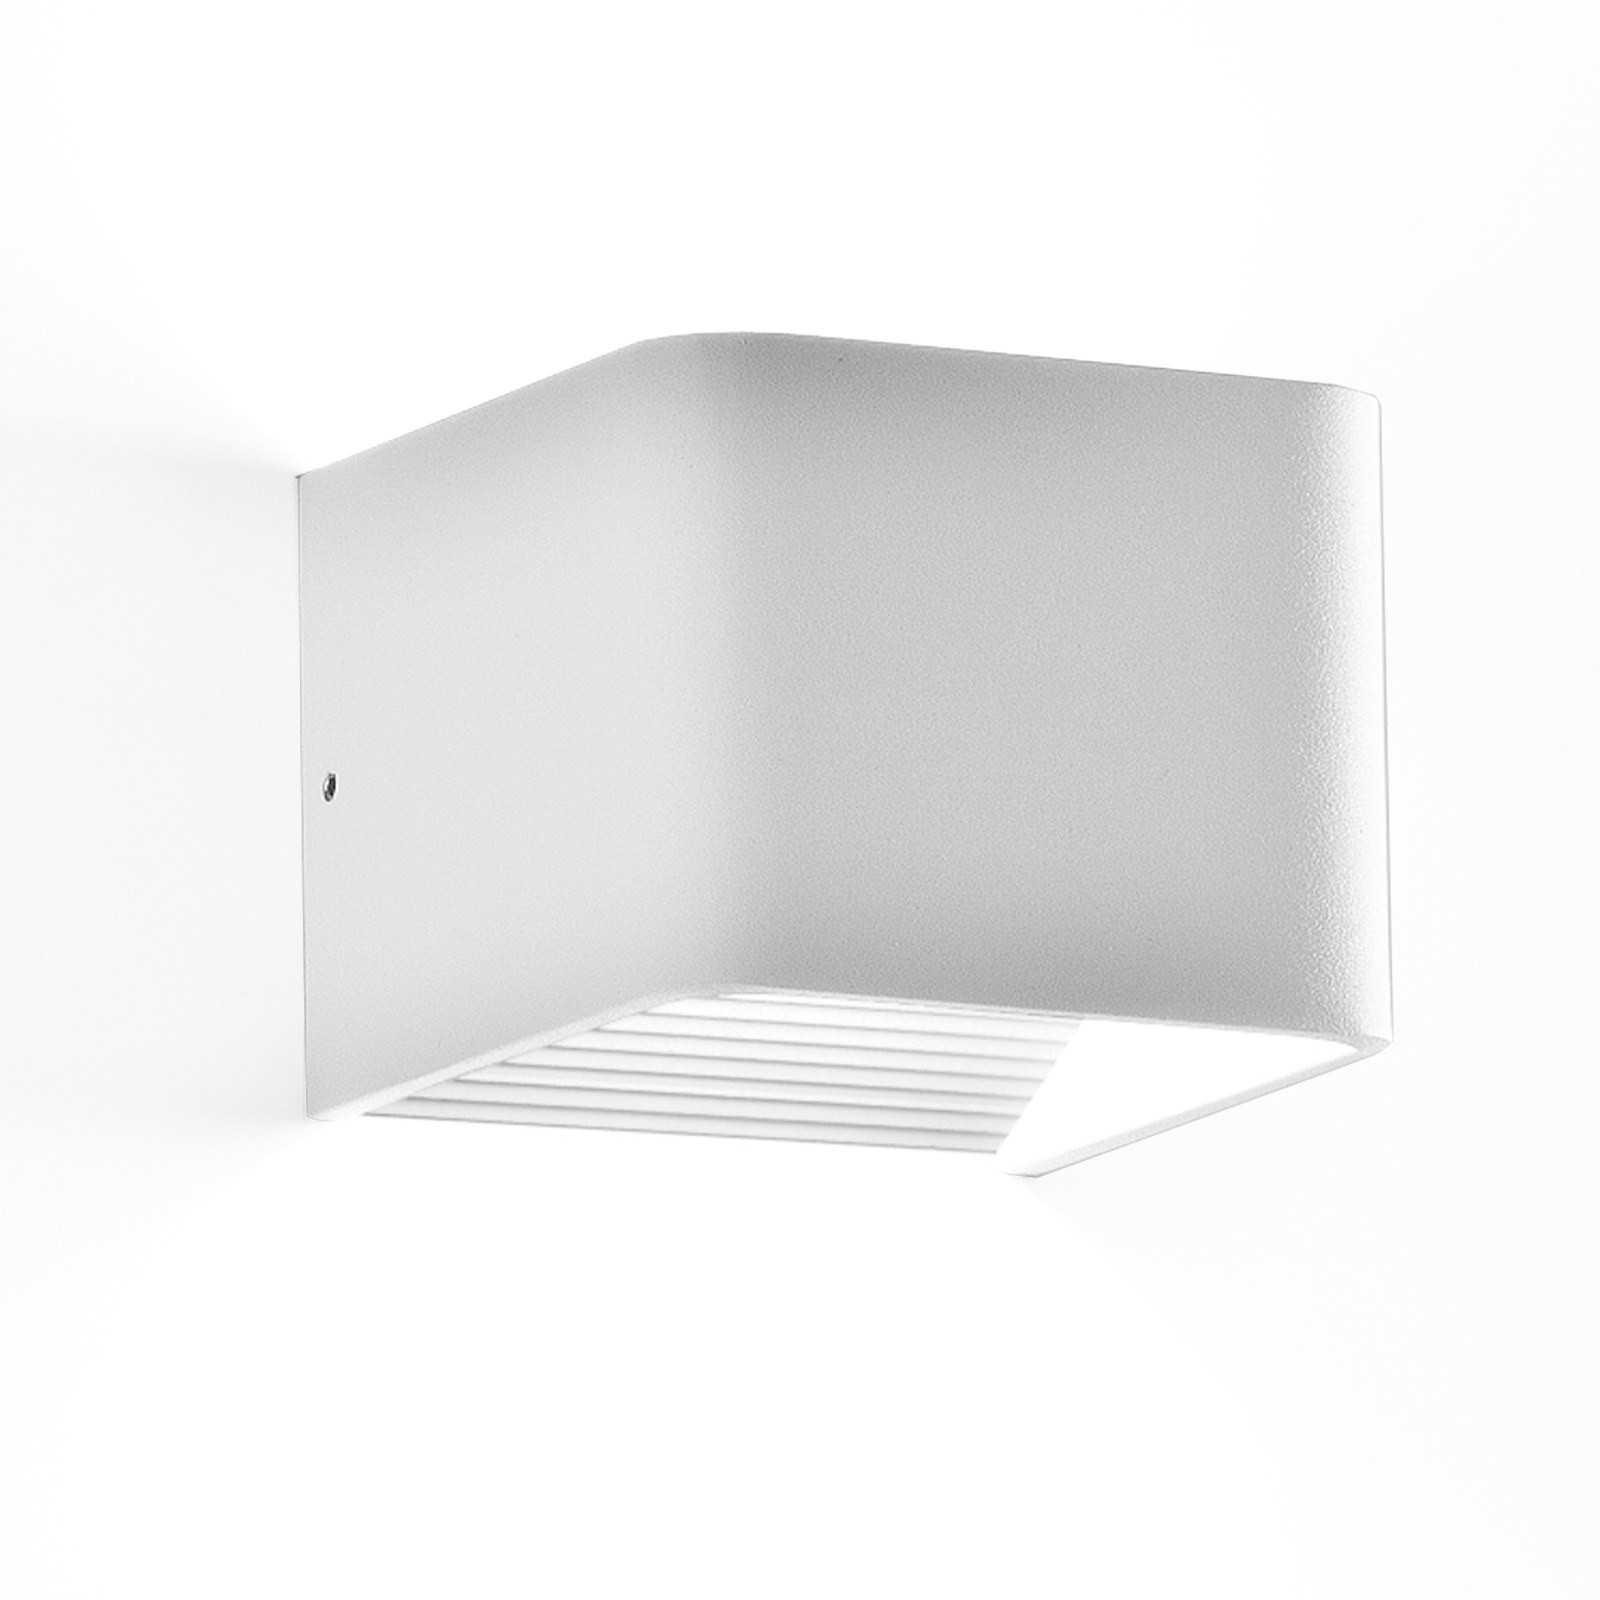 Applique lampada da parete a led moderno luce design cubo - Lampada da parete design ...